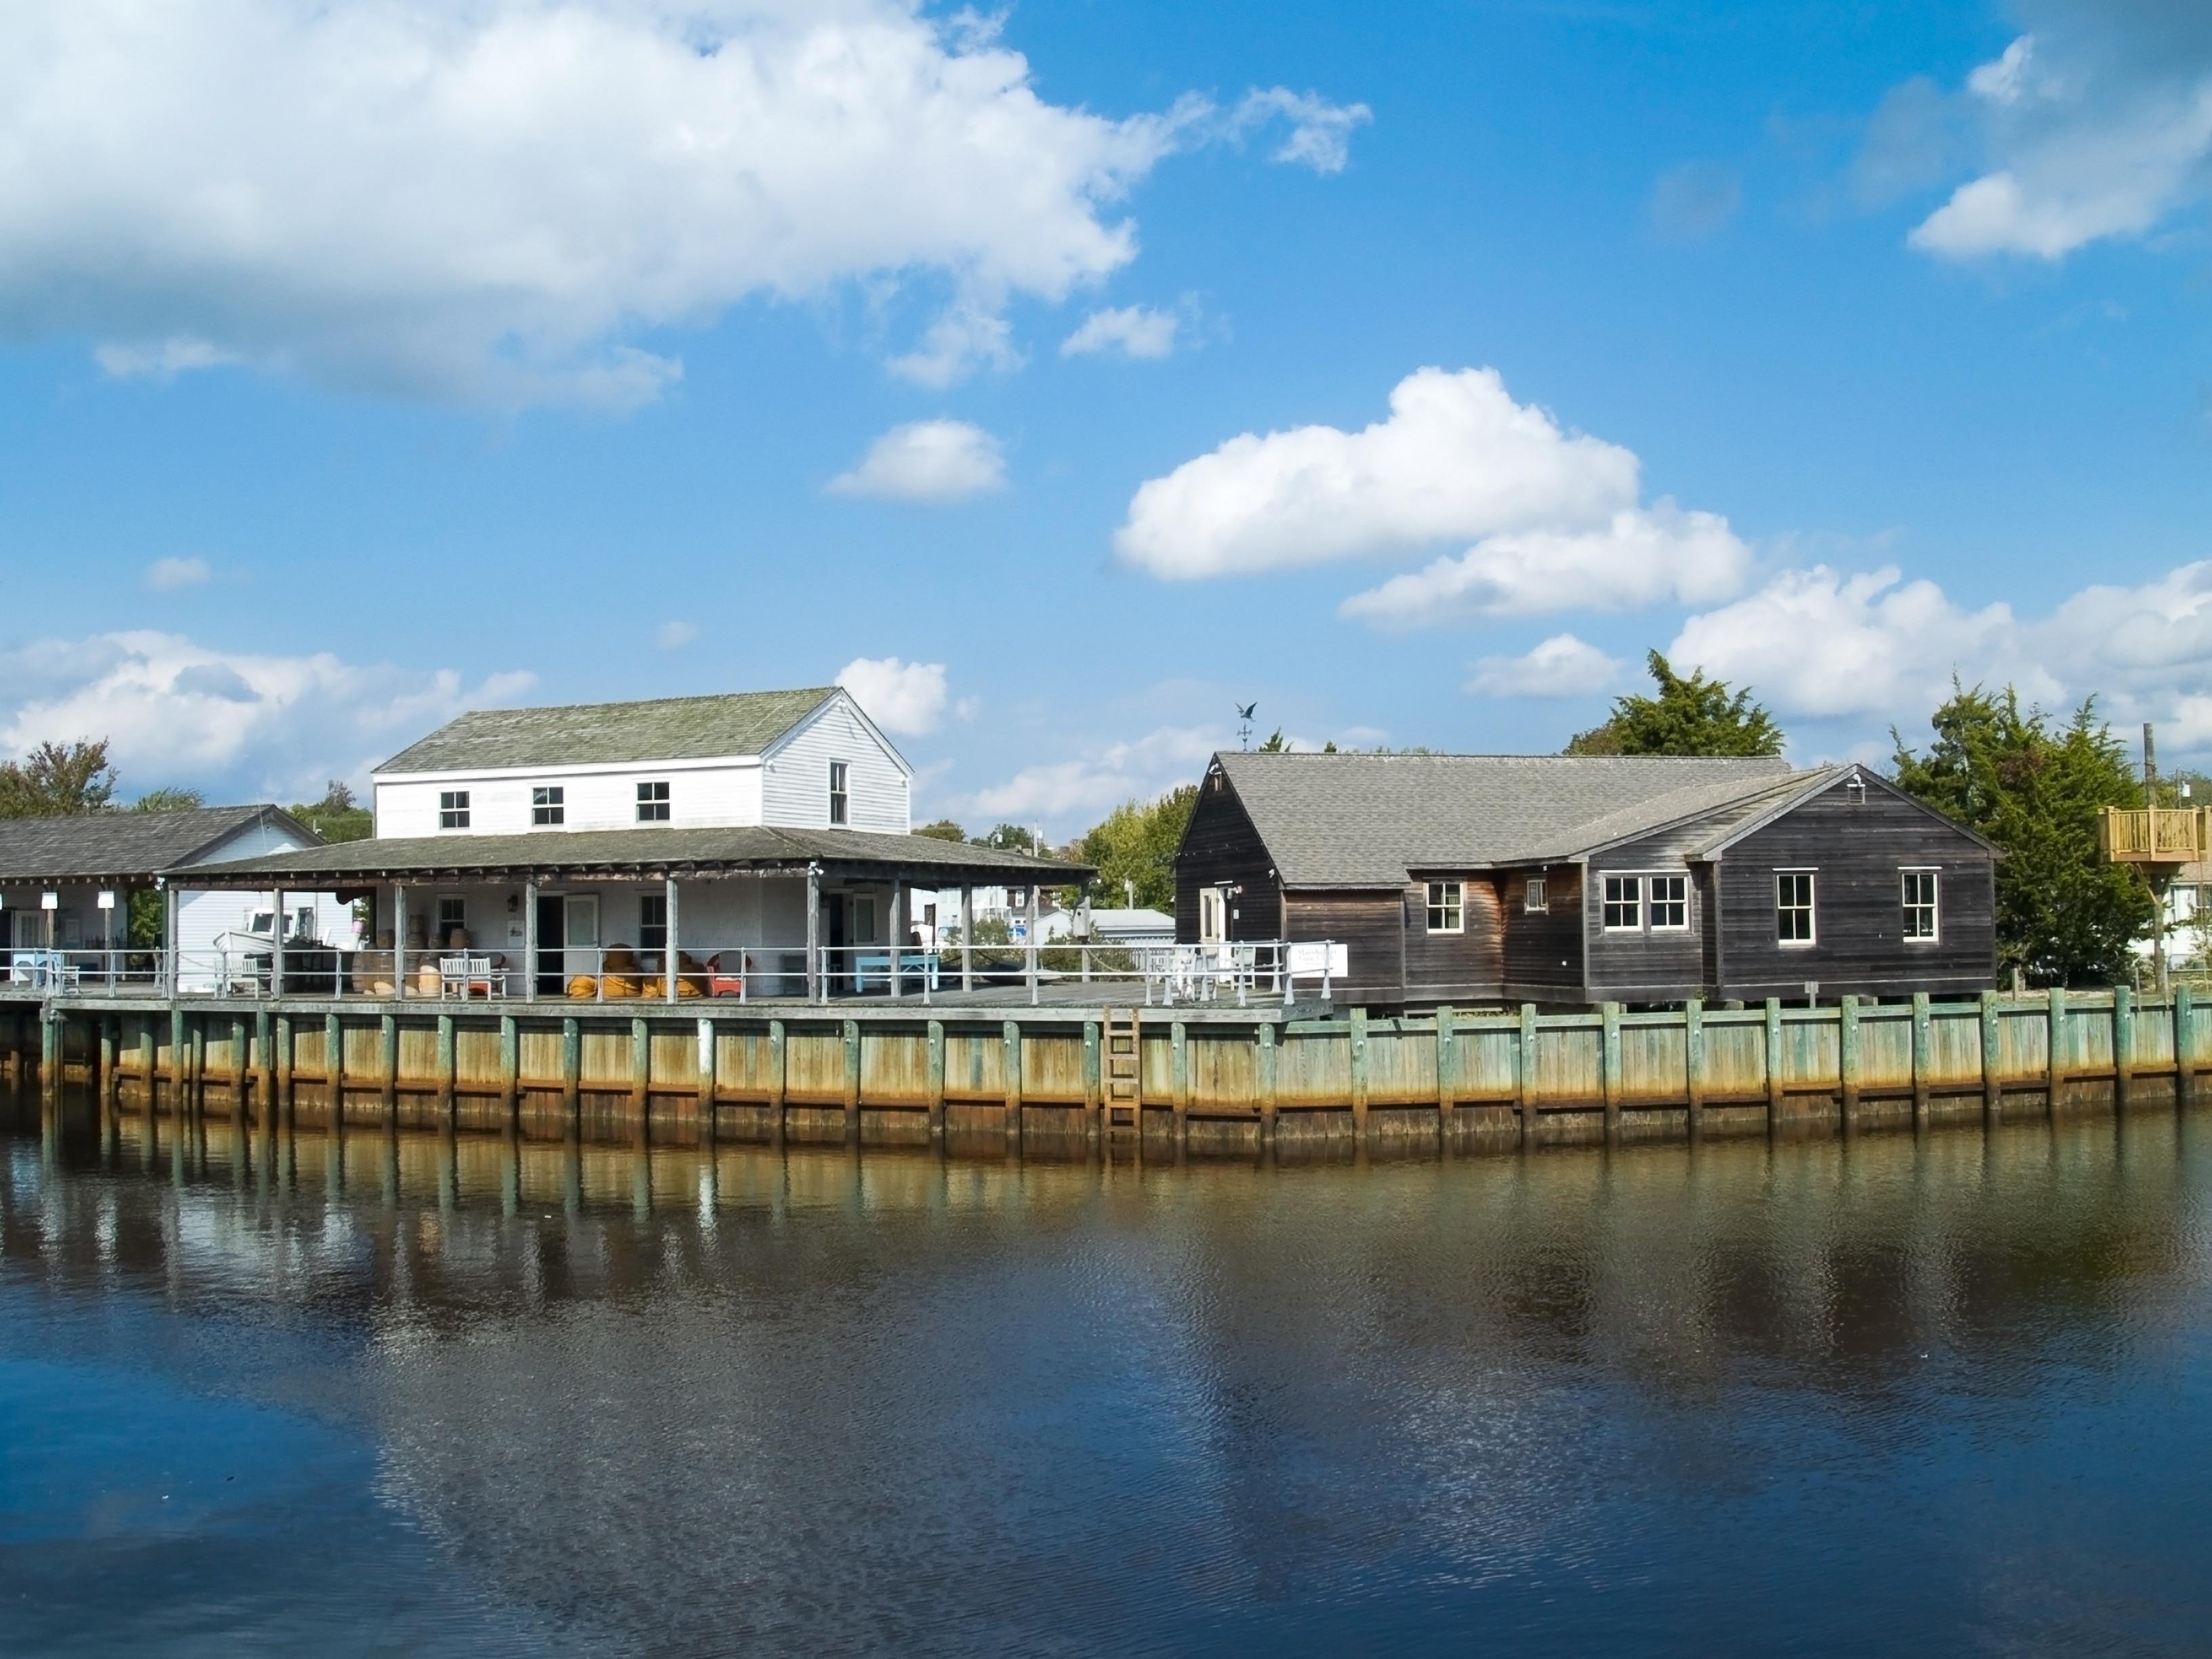 Tuckerton, New Jersey, United States of America